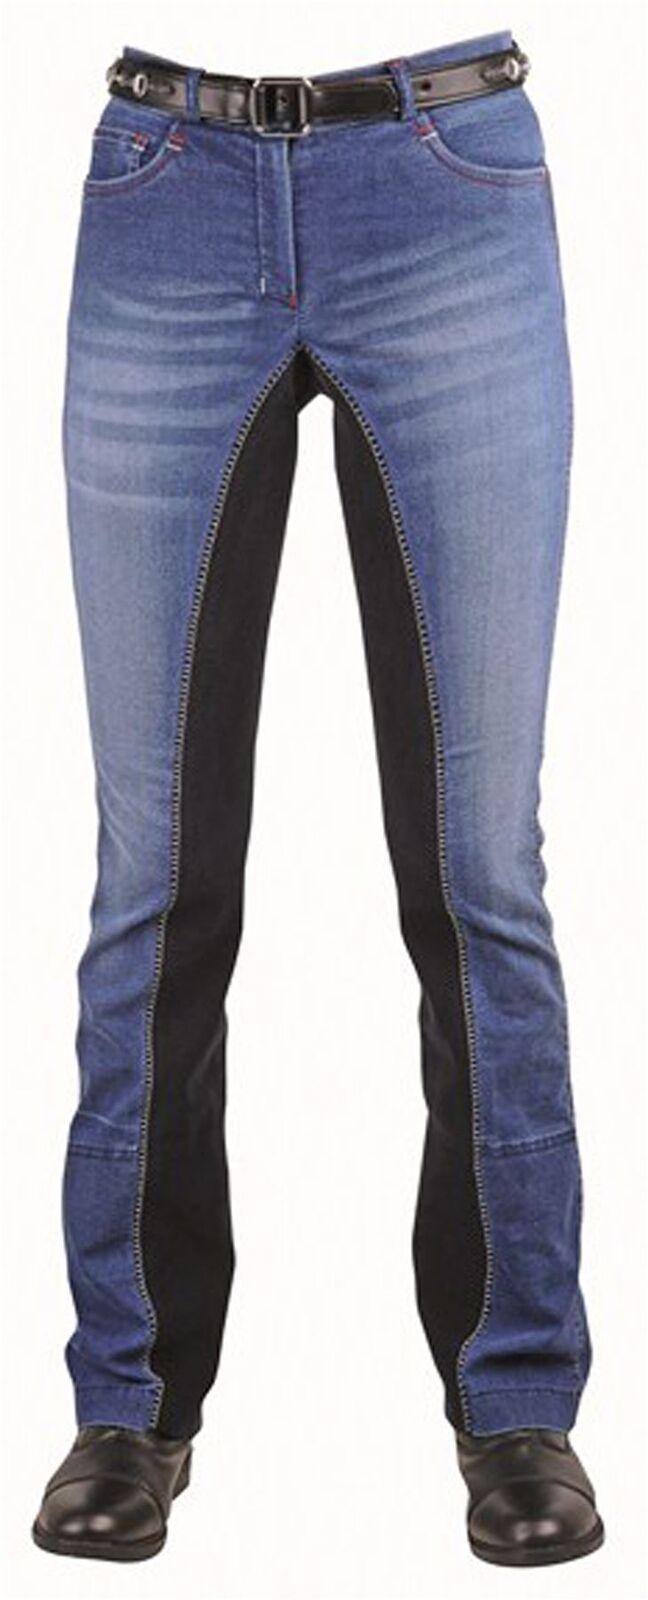 HKM Adult Junior Summer Elastic Denim Full Seat Breathable Jodhpur Breeches